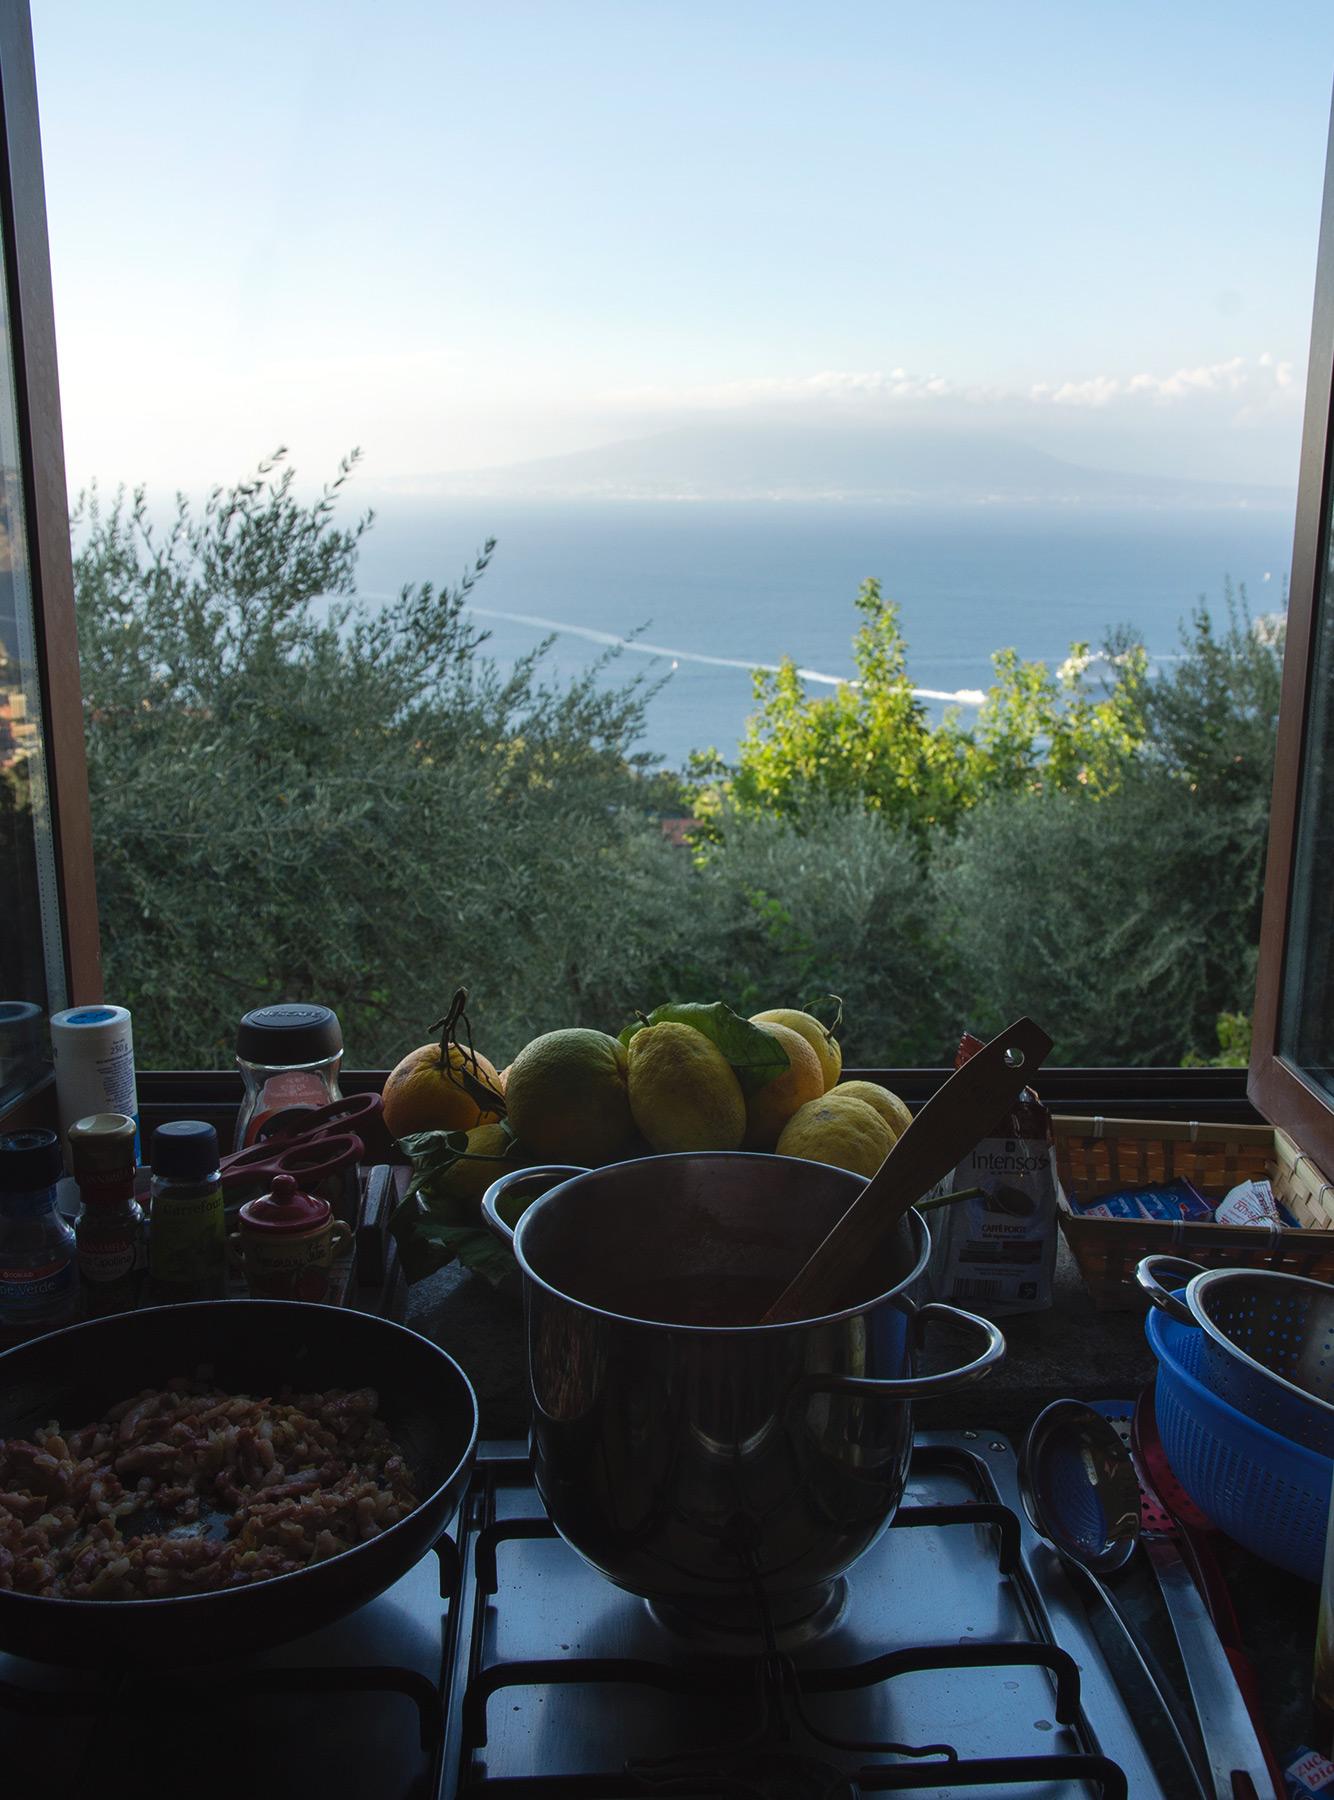 Ocean view from kitchen window